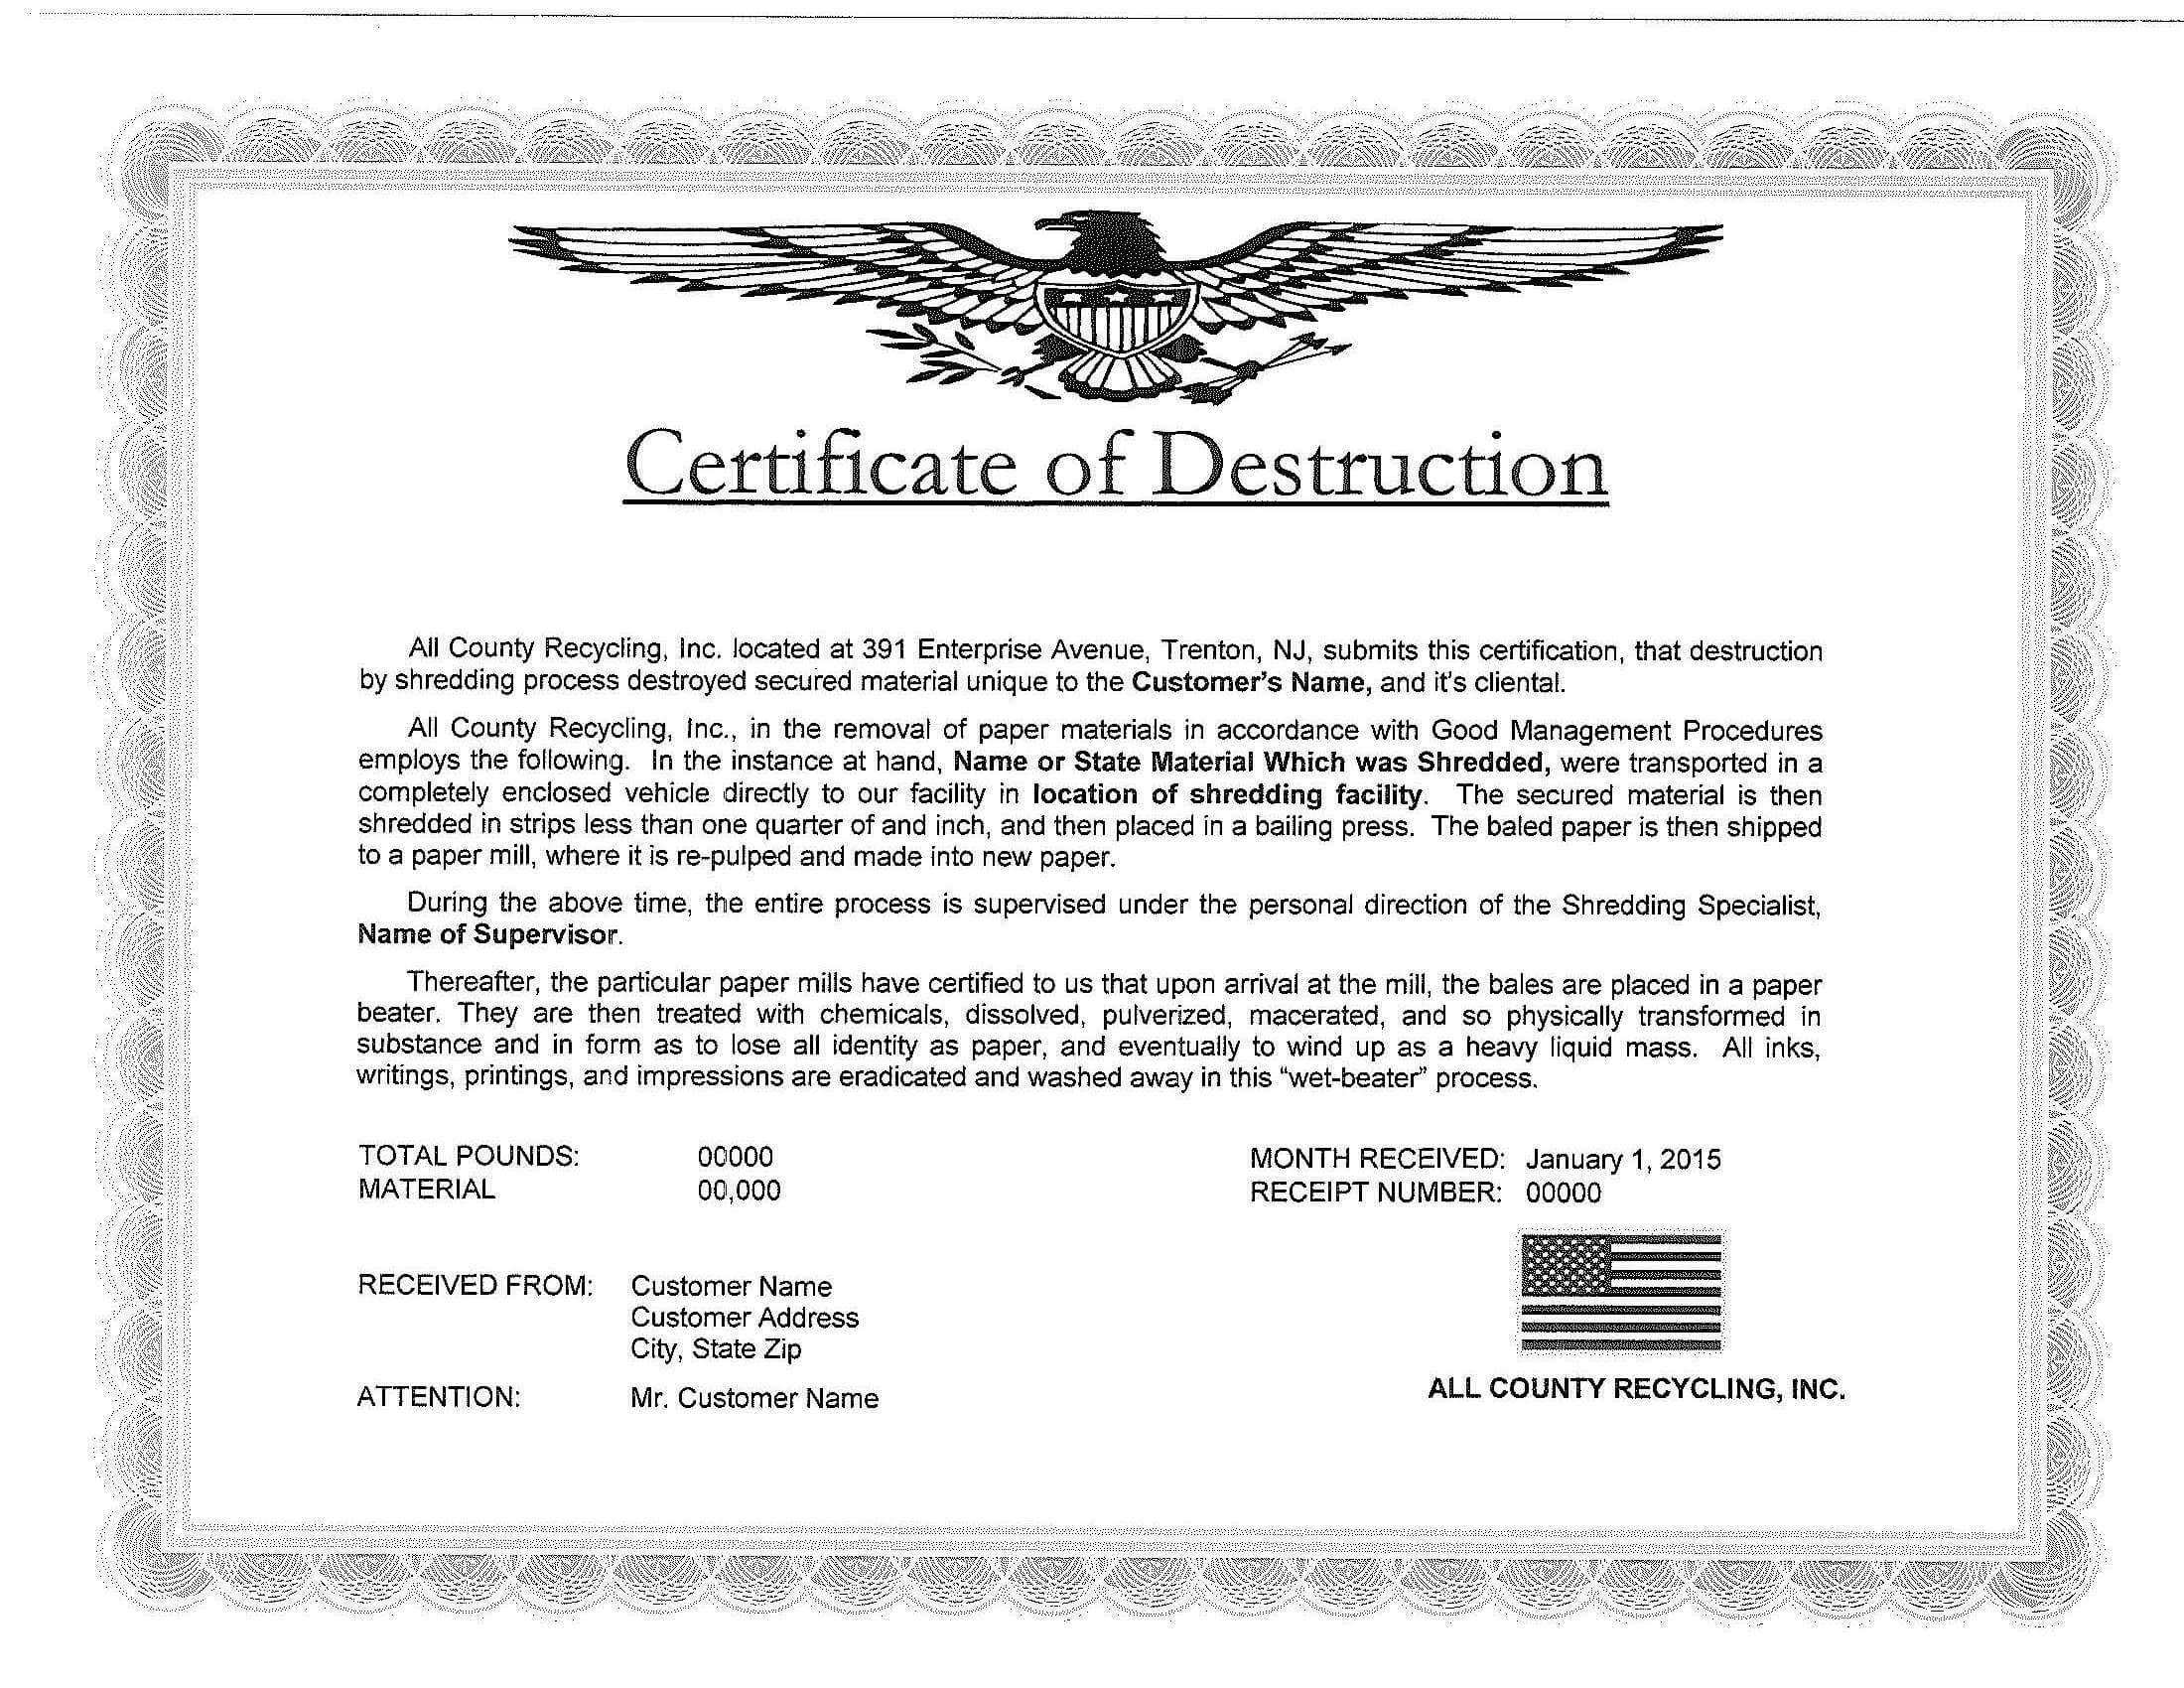 🥰5+ Free Certificate Of Destruction Sample Templates🥰 Intended For Free Certificate Of Destruction Template